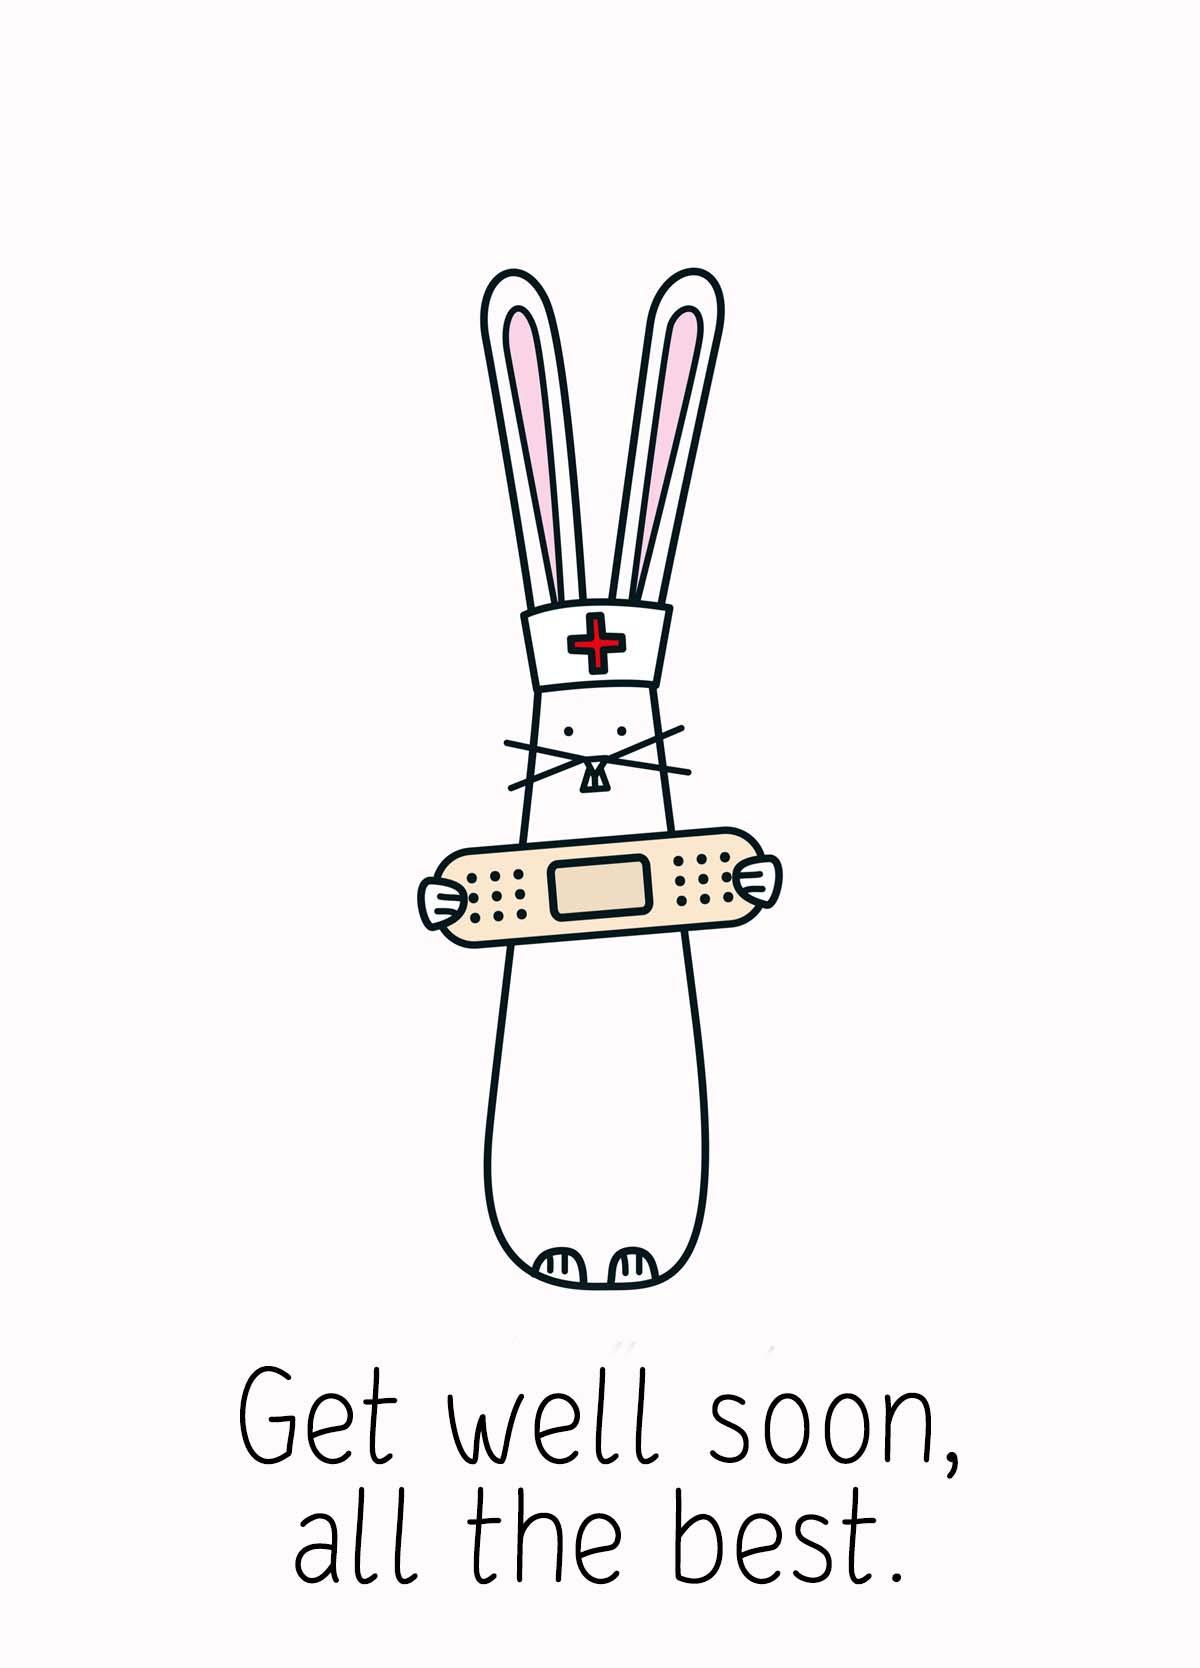 Ecards Get well very soon!